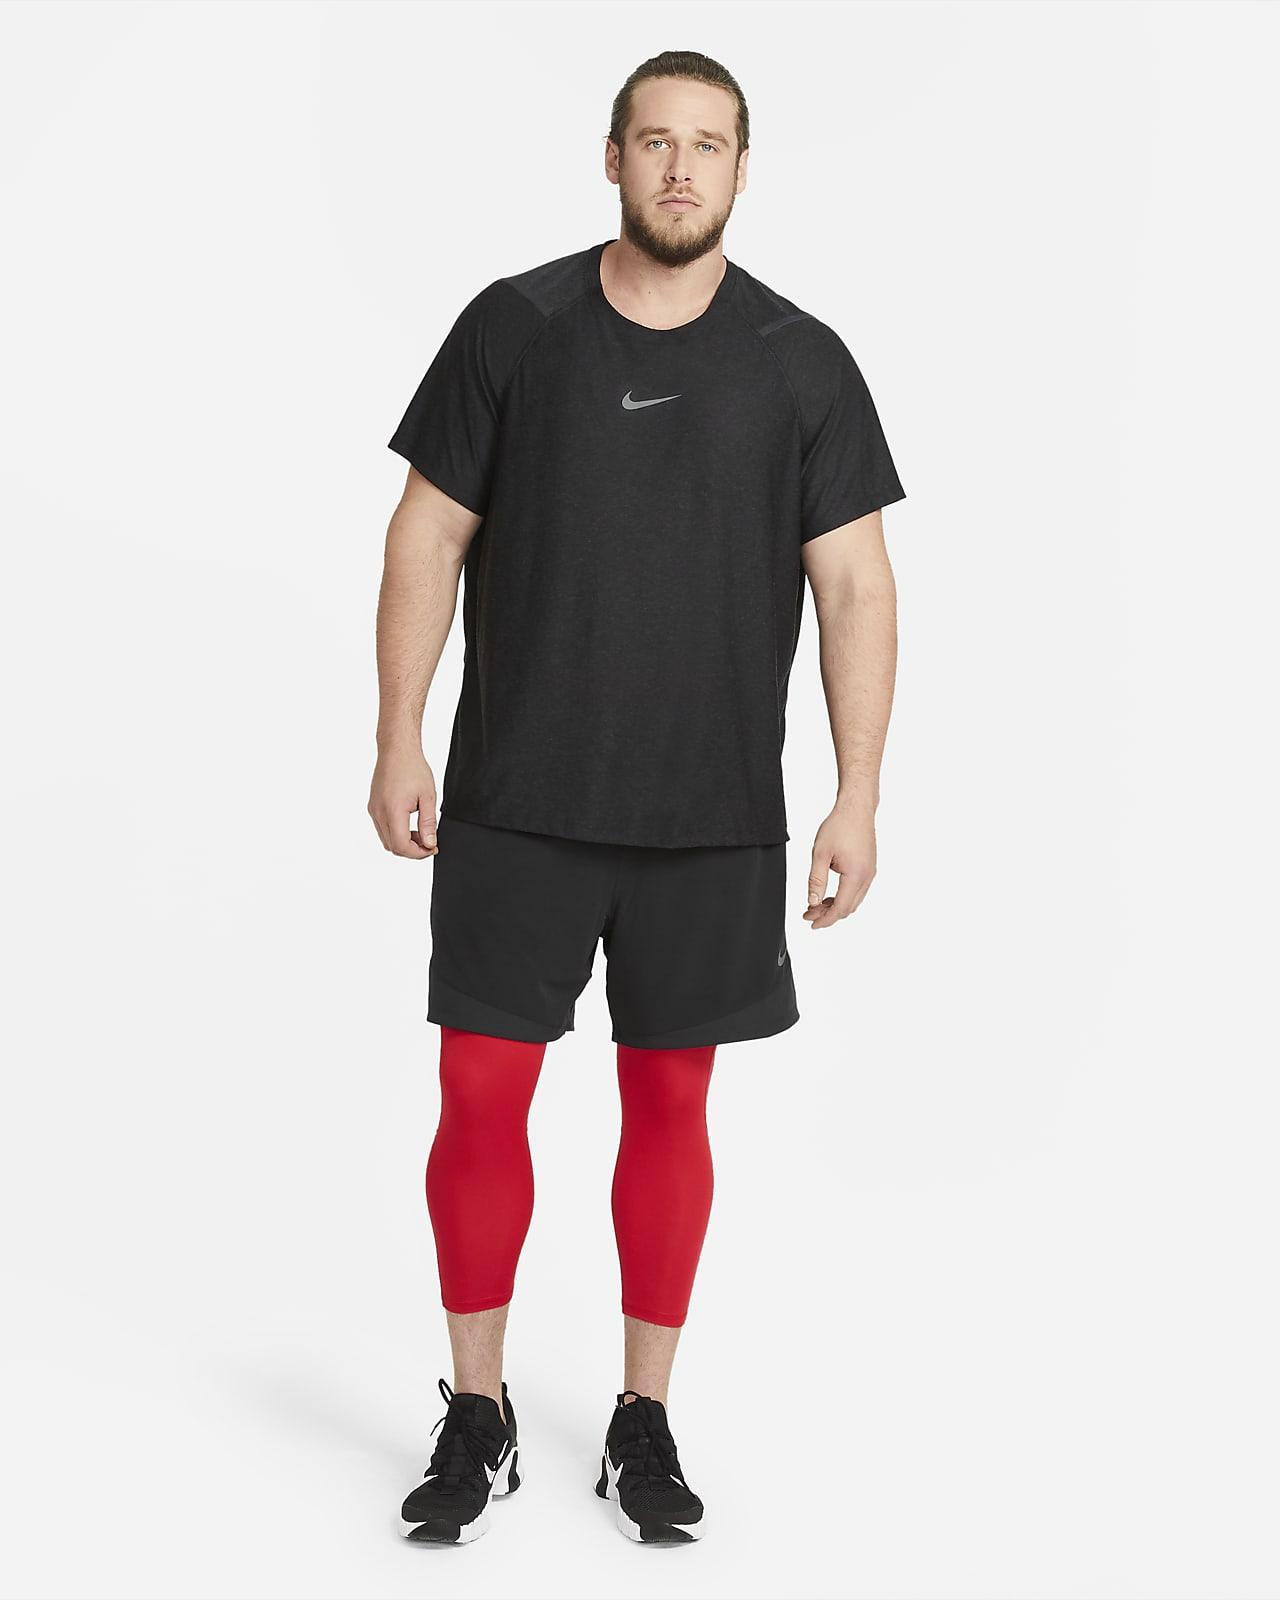 Retener Ardiente Nublado  Nike Pro Men's 3/4 Tights. Nike.com